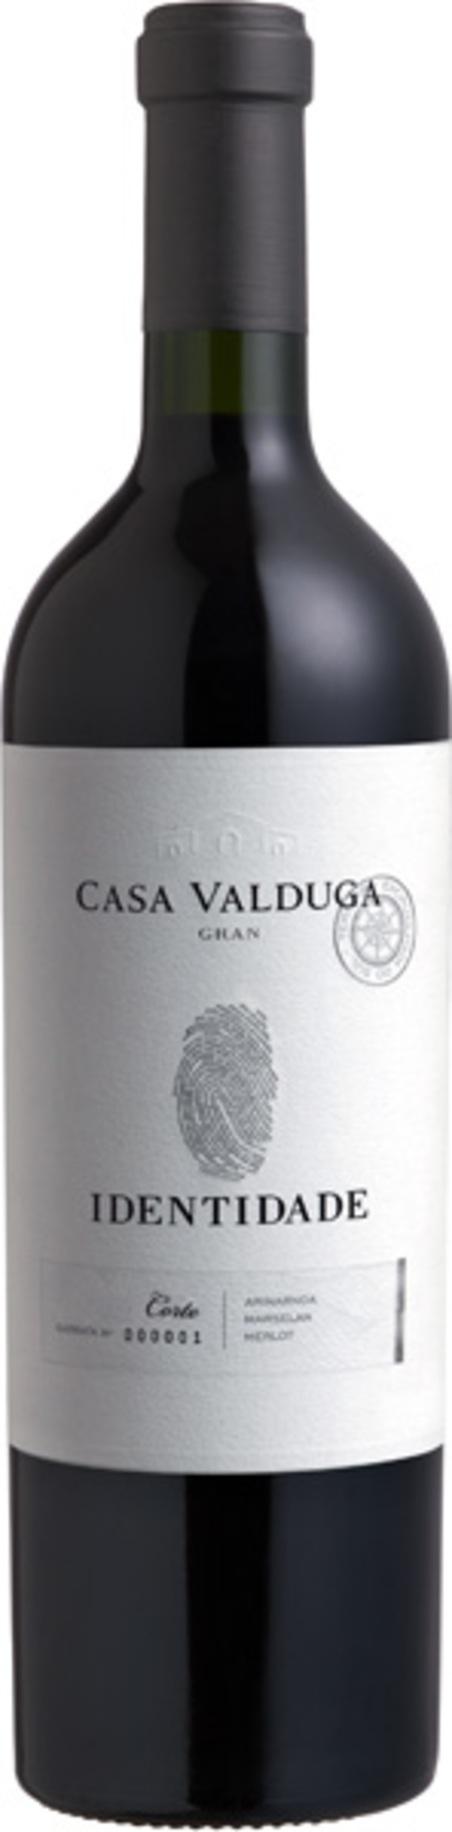 vinho identidade gran reserva cortegf 750ml